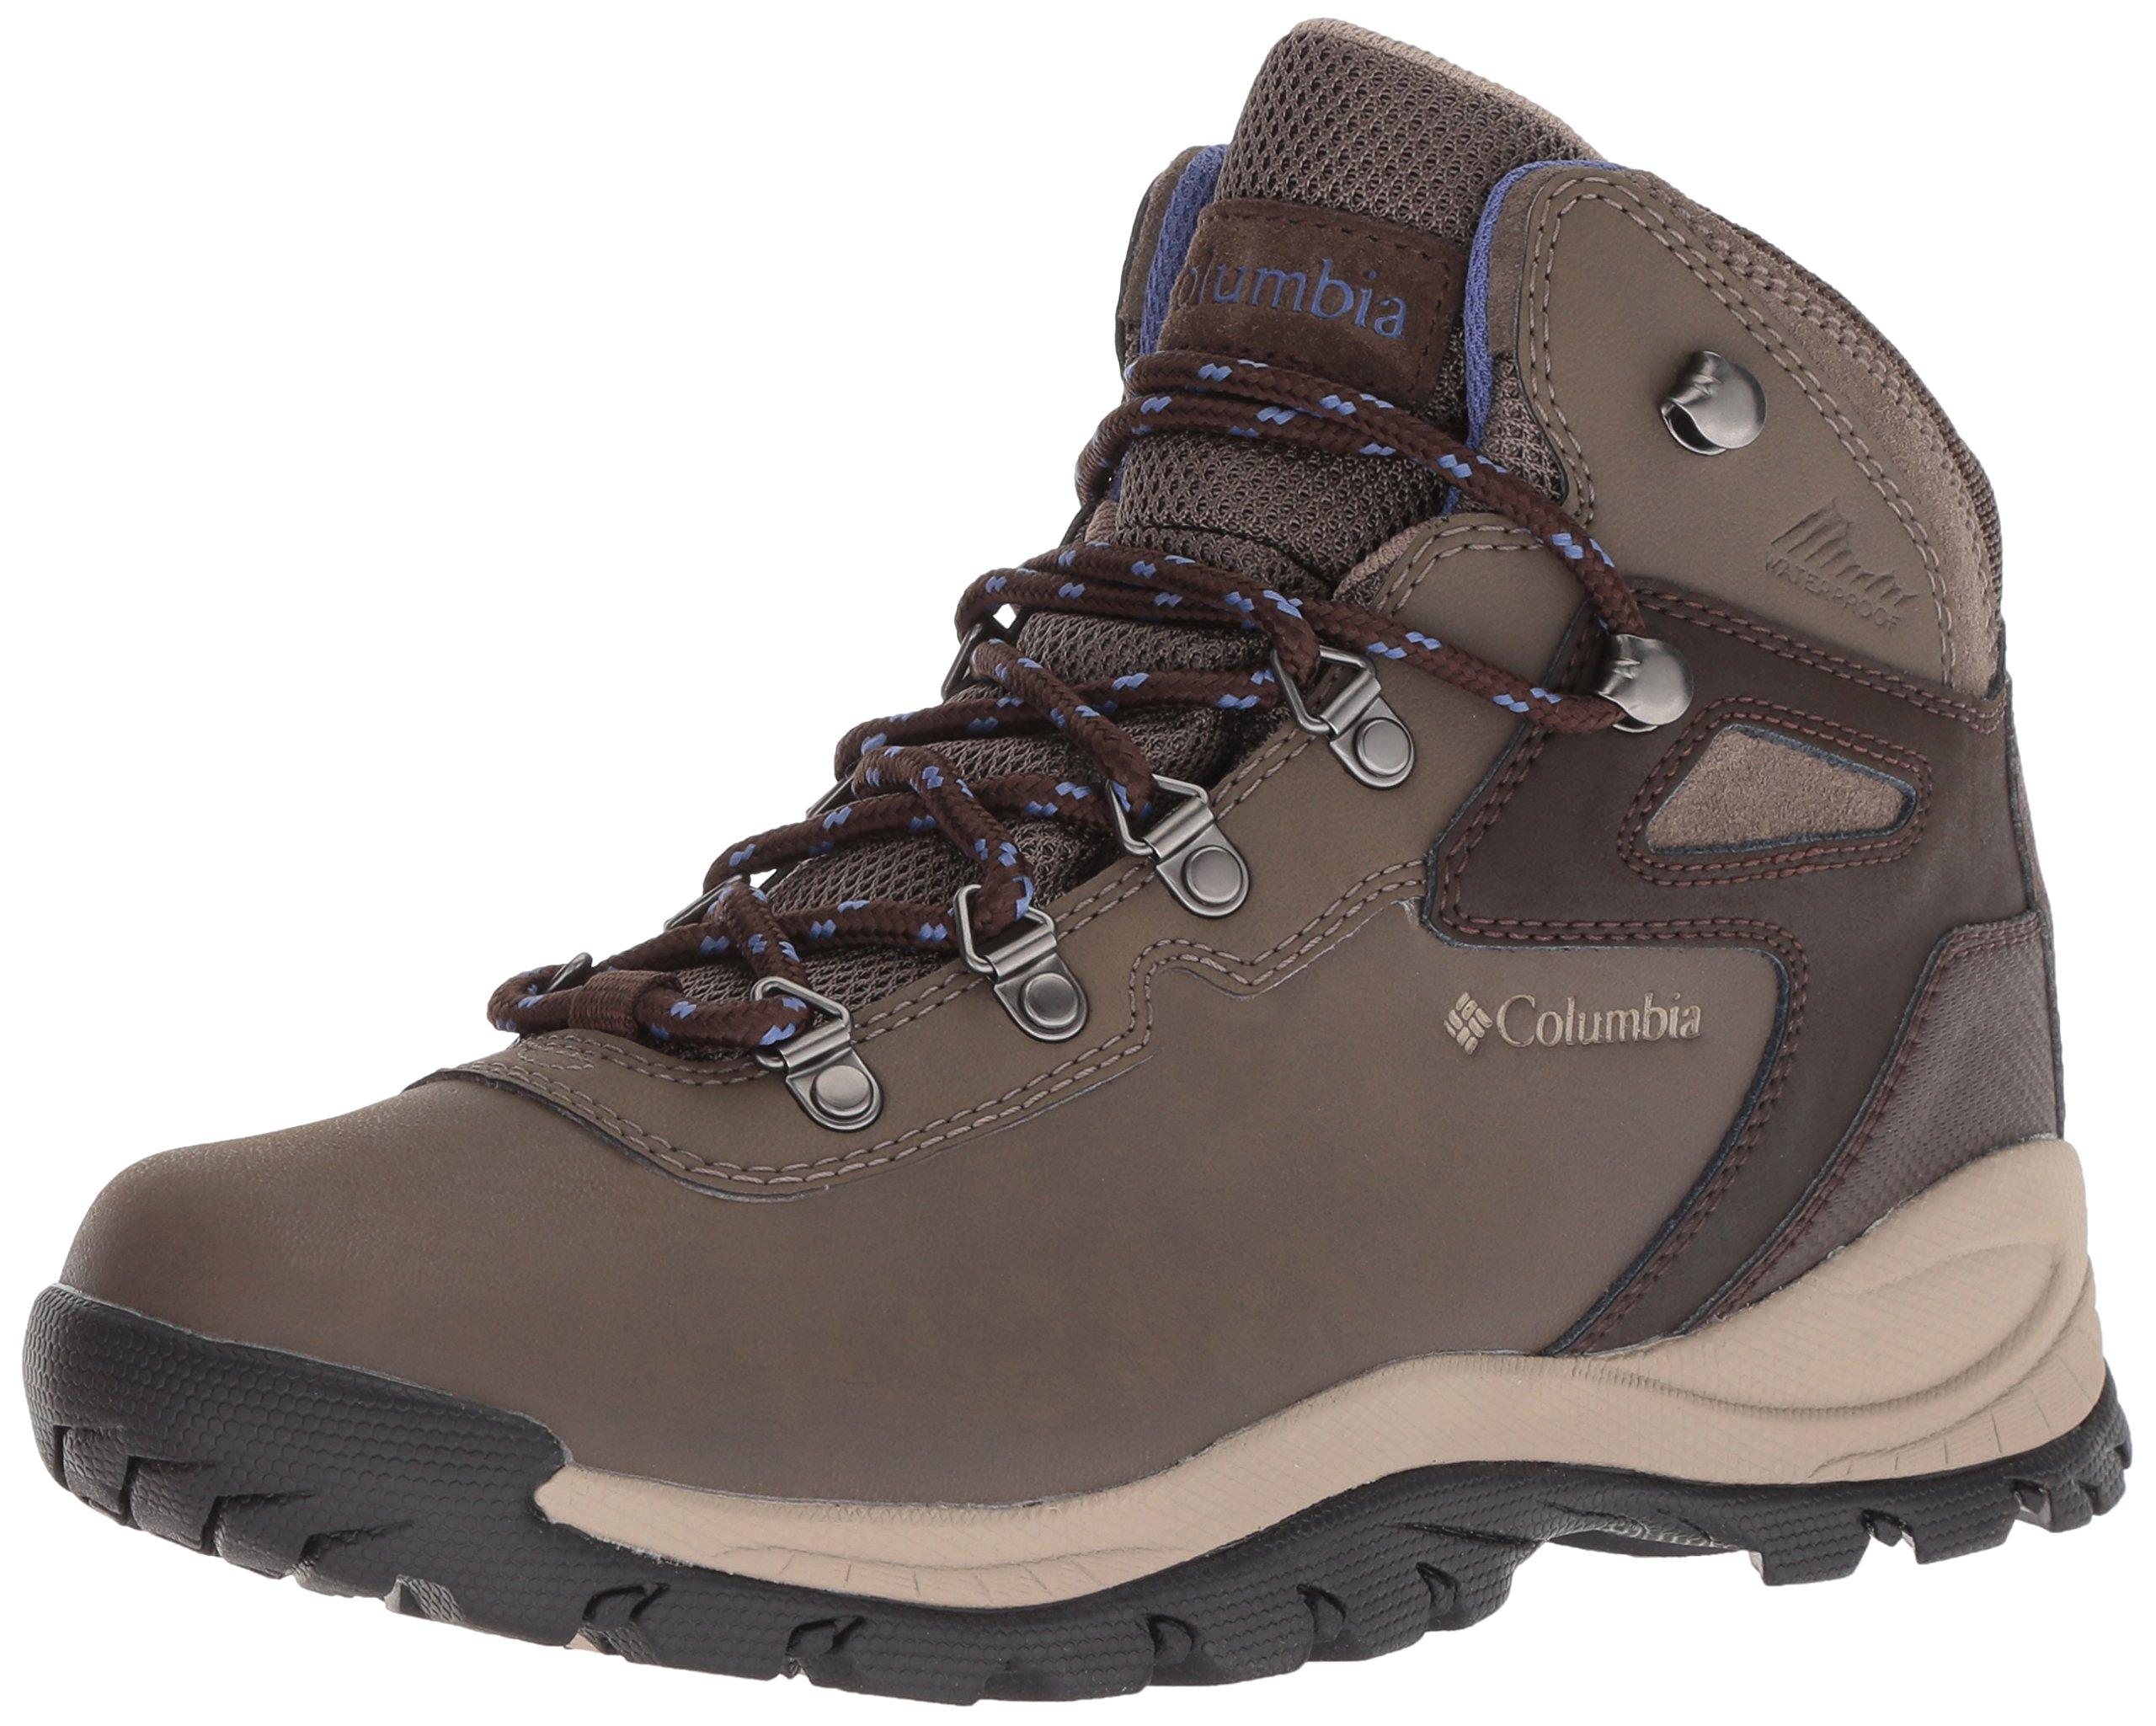 Columbia Women's Newton Ridge Plus Hiking Shoe, Mud, Eve, 9 Wide US